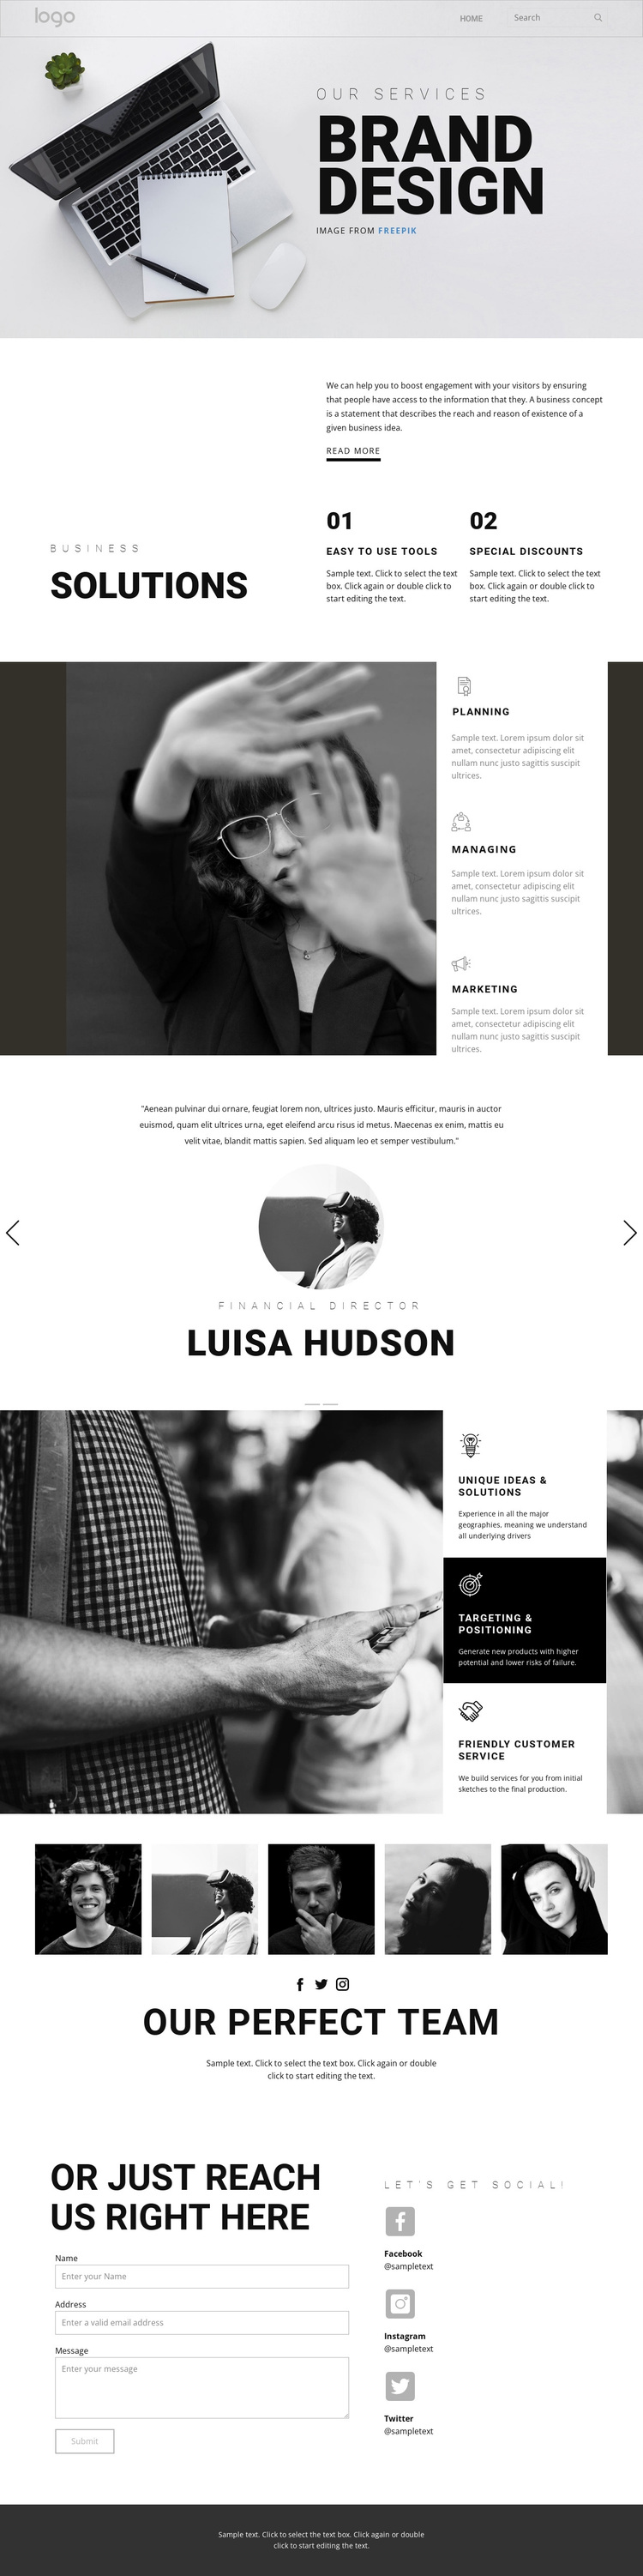 Doing branding for business Joomla Page Builder